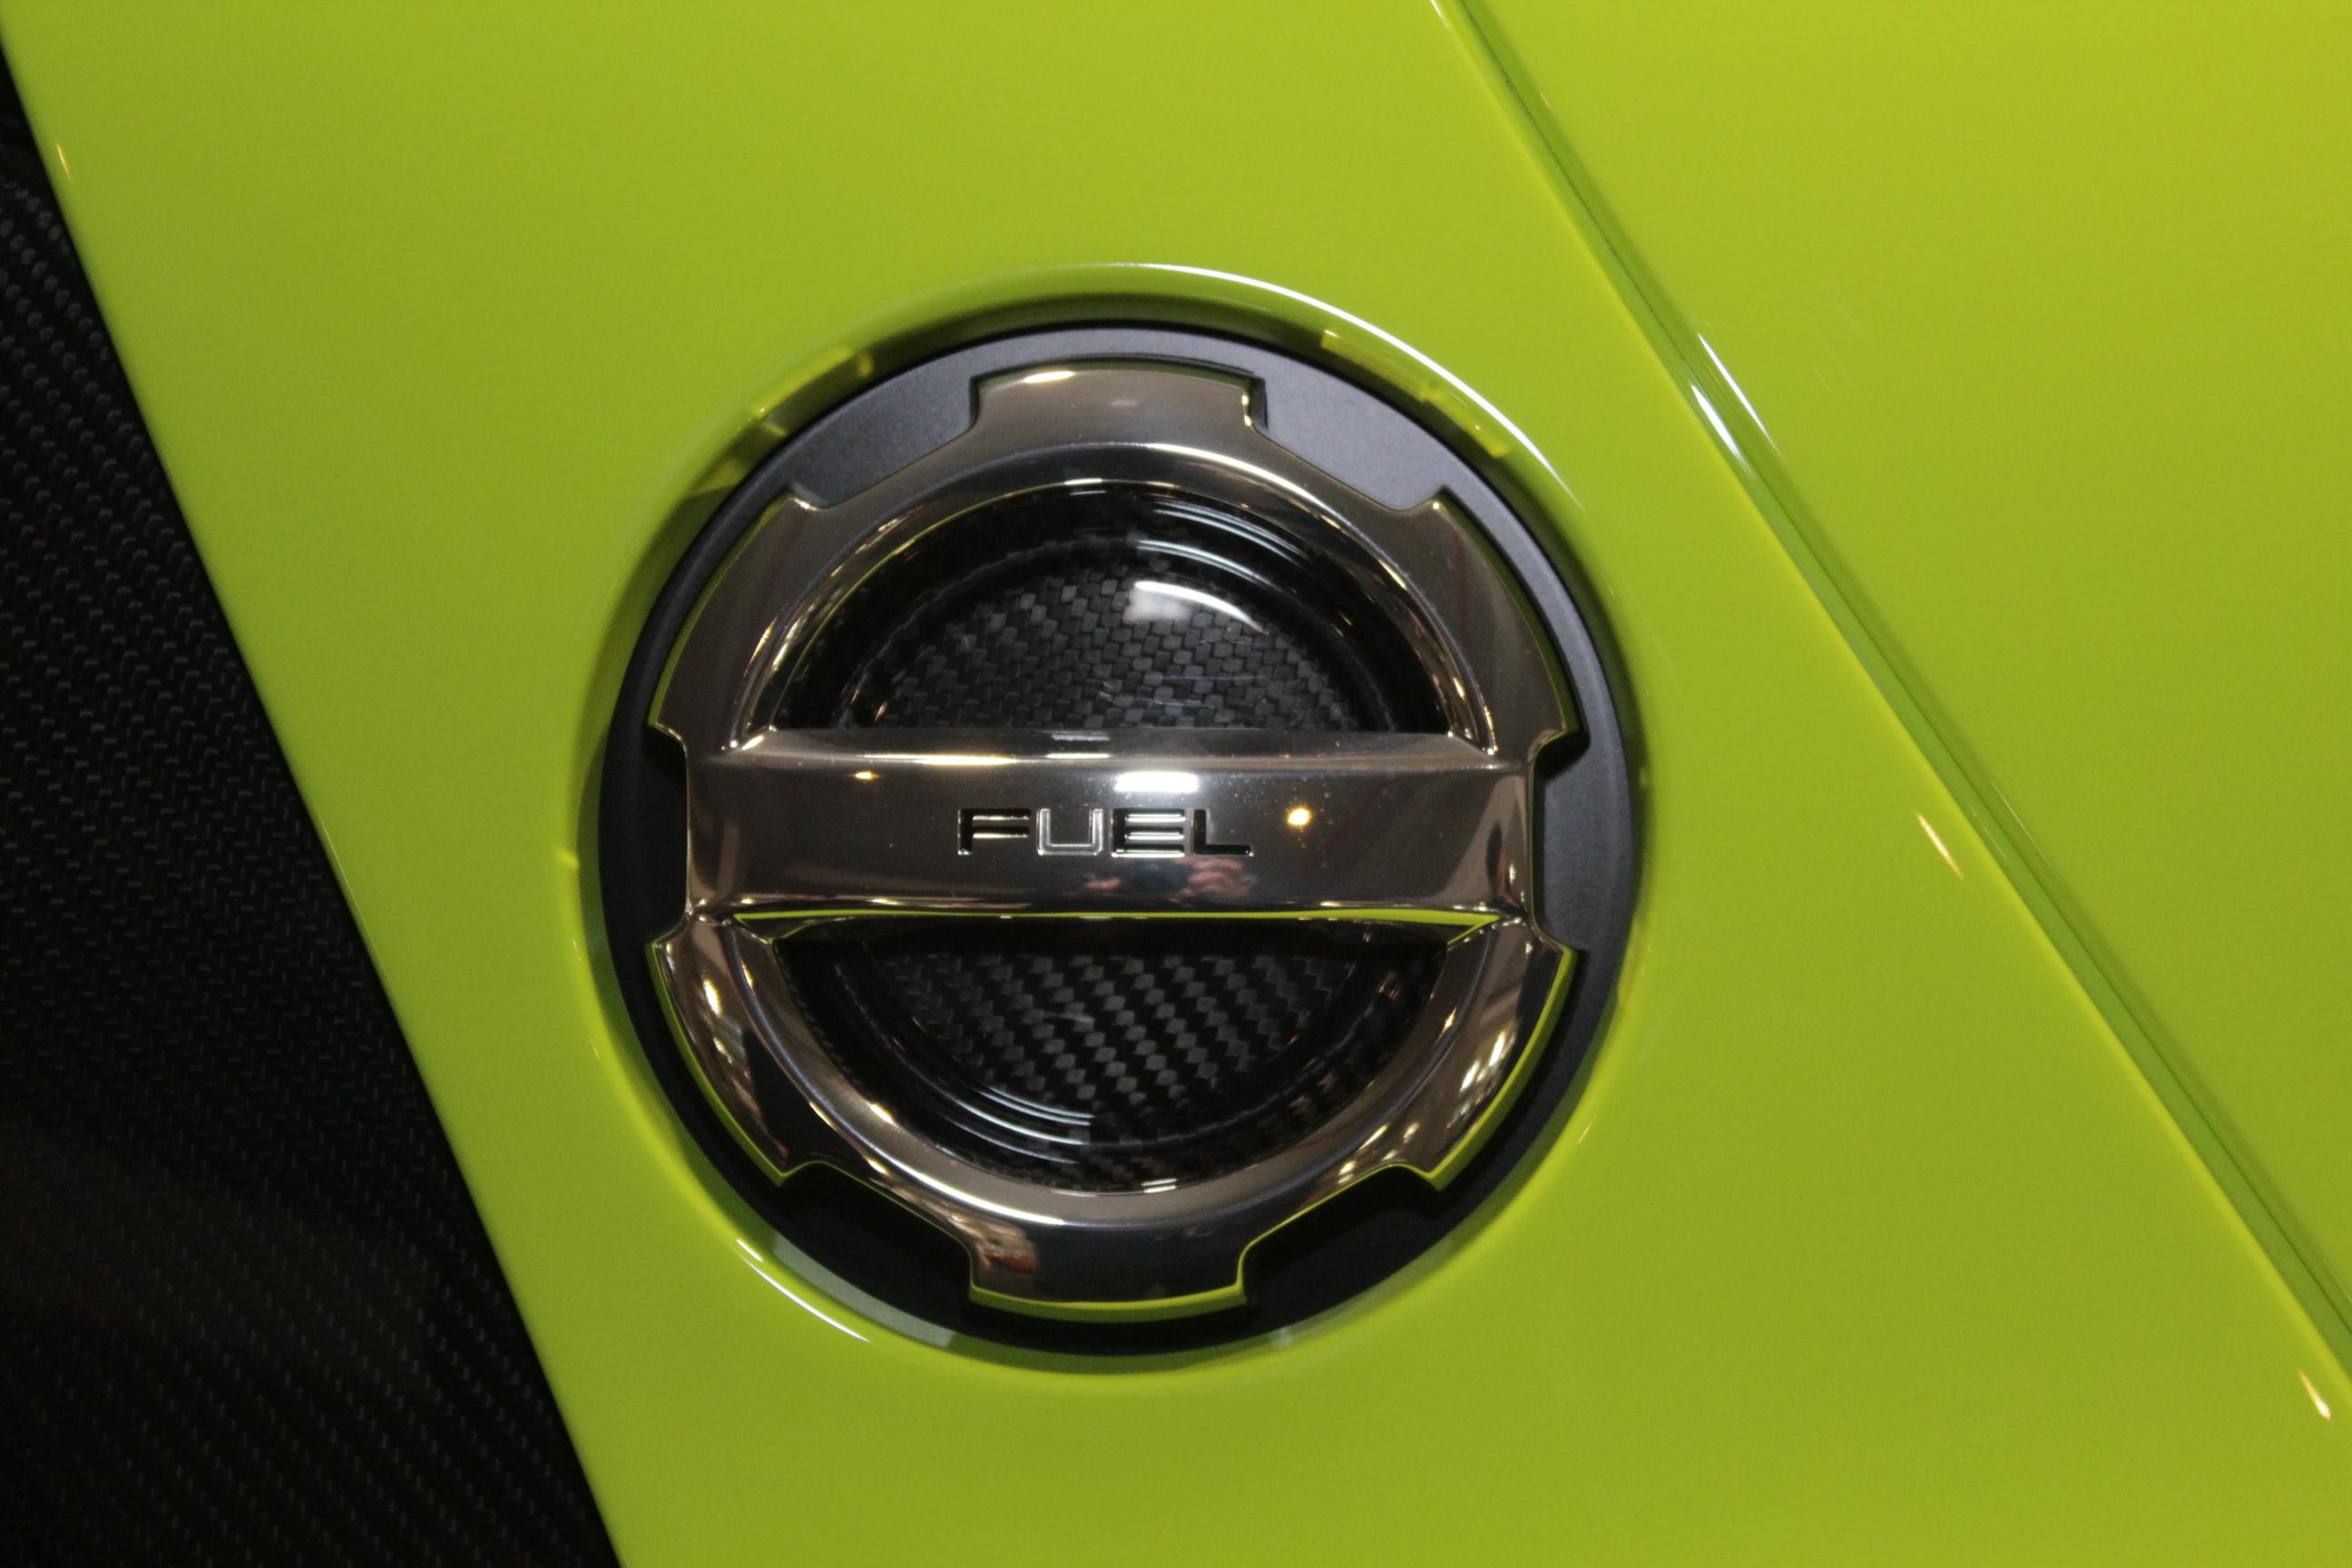 30159?m=max&w=2000&h=2000 Gorgeous Porsche 918 Spyder Acid Green Cars Trend